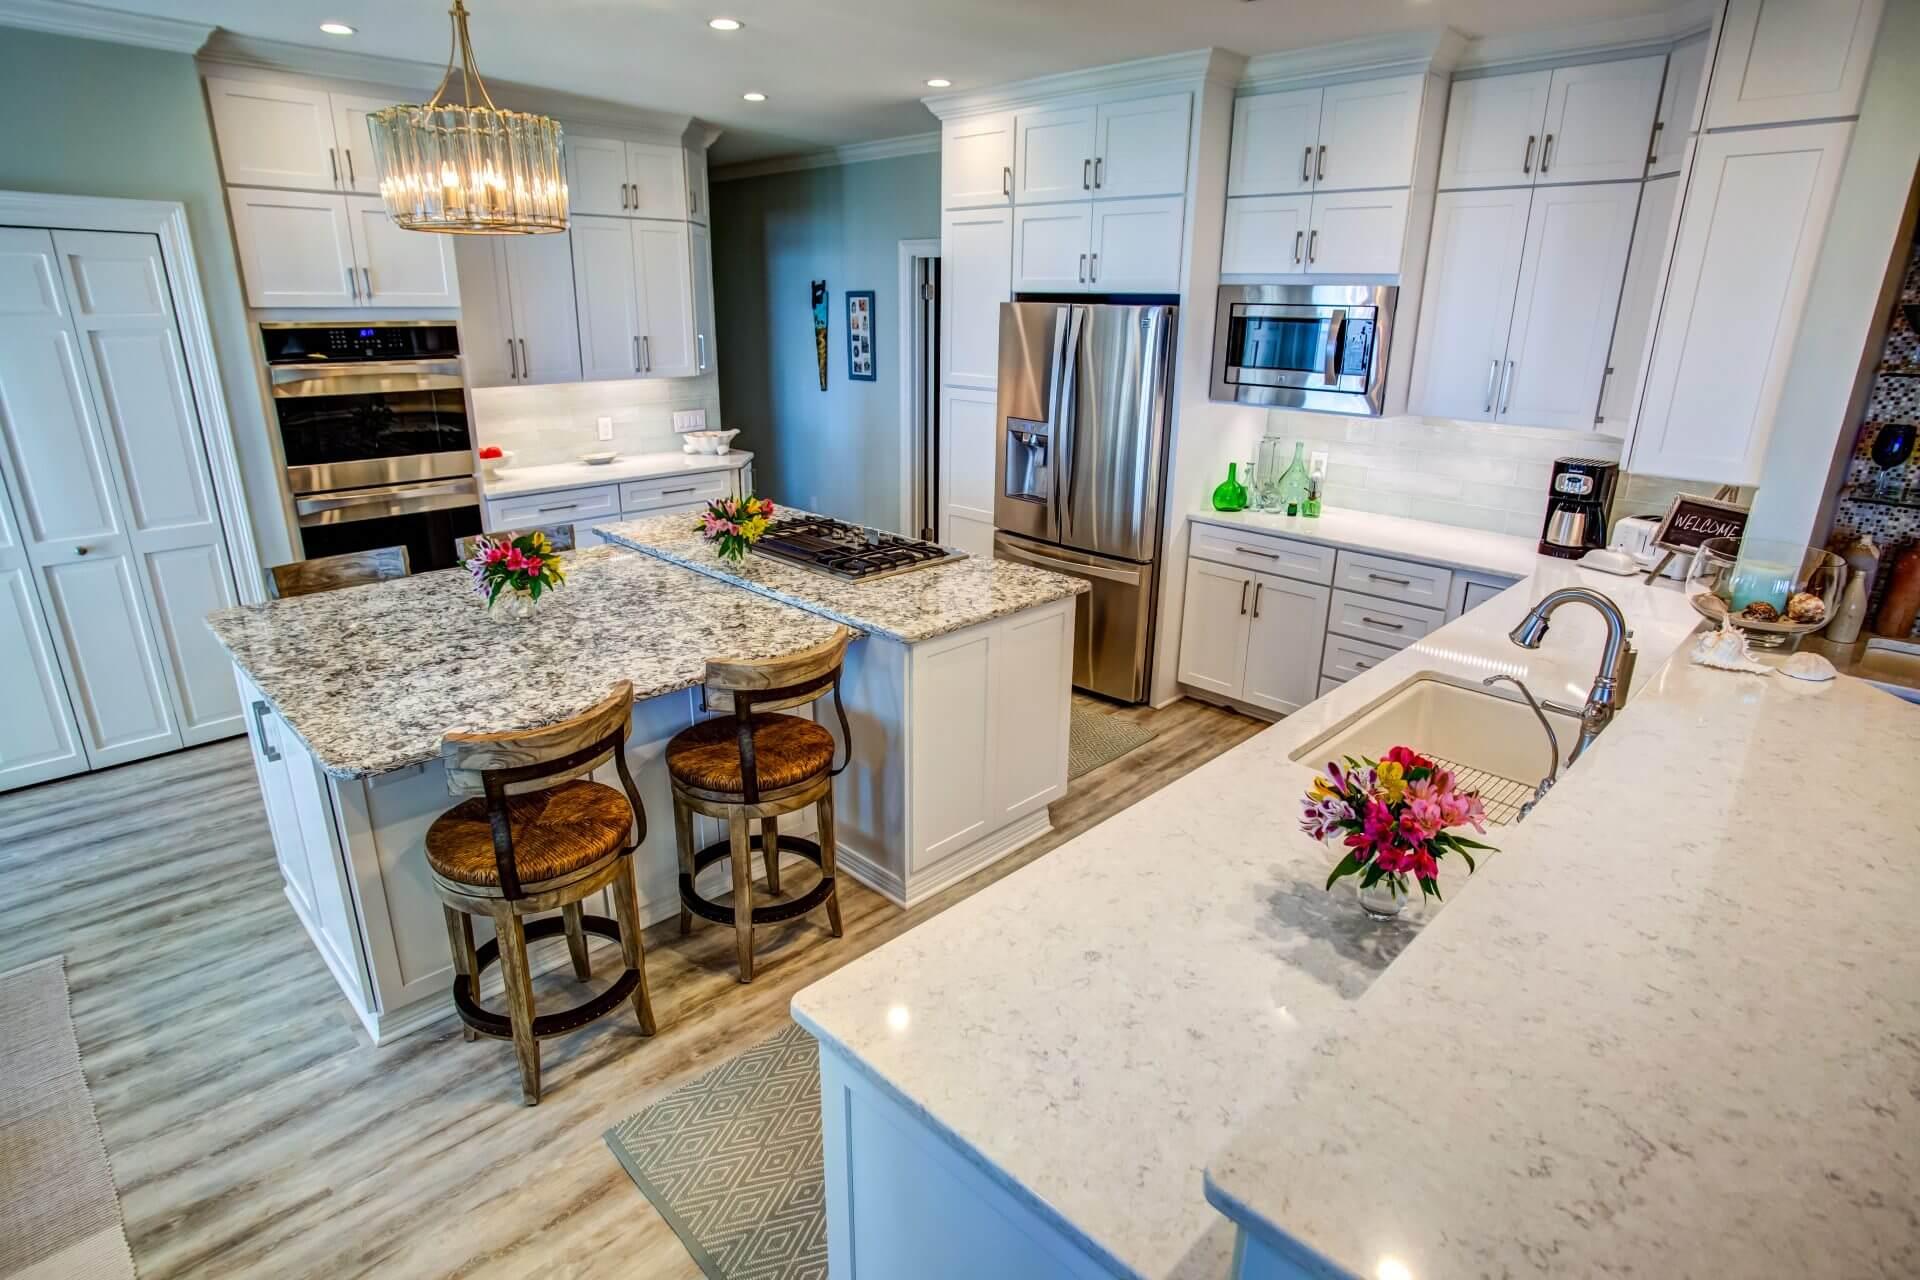 Sleek modern kitchen with stacked Shaker cabinets, quartz countertops and glass subway tile backsplash